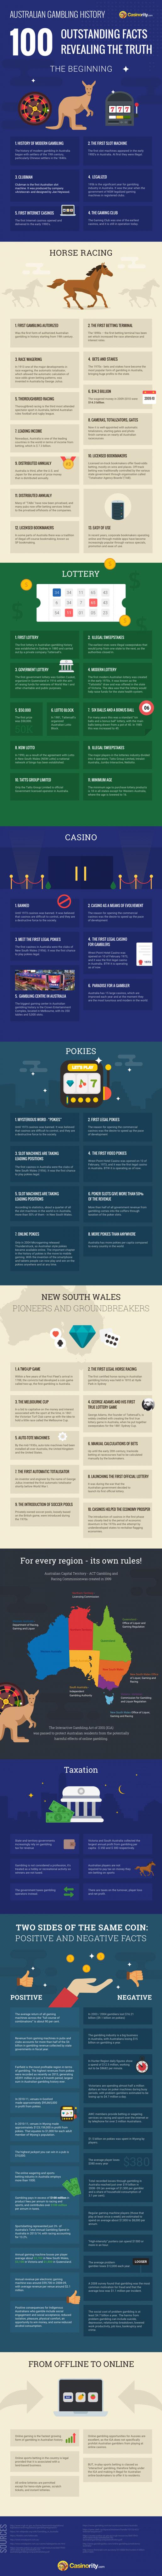 australian-gambling-history-casinority